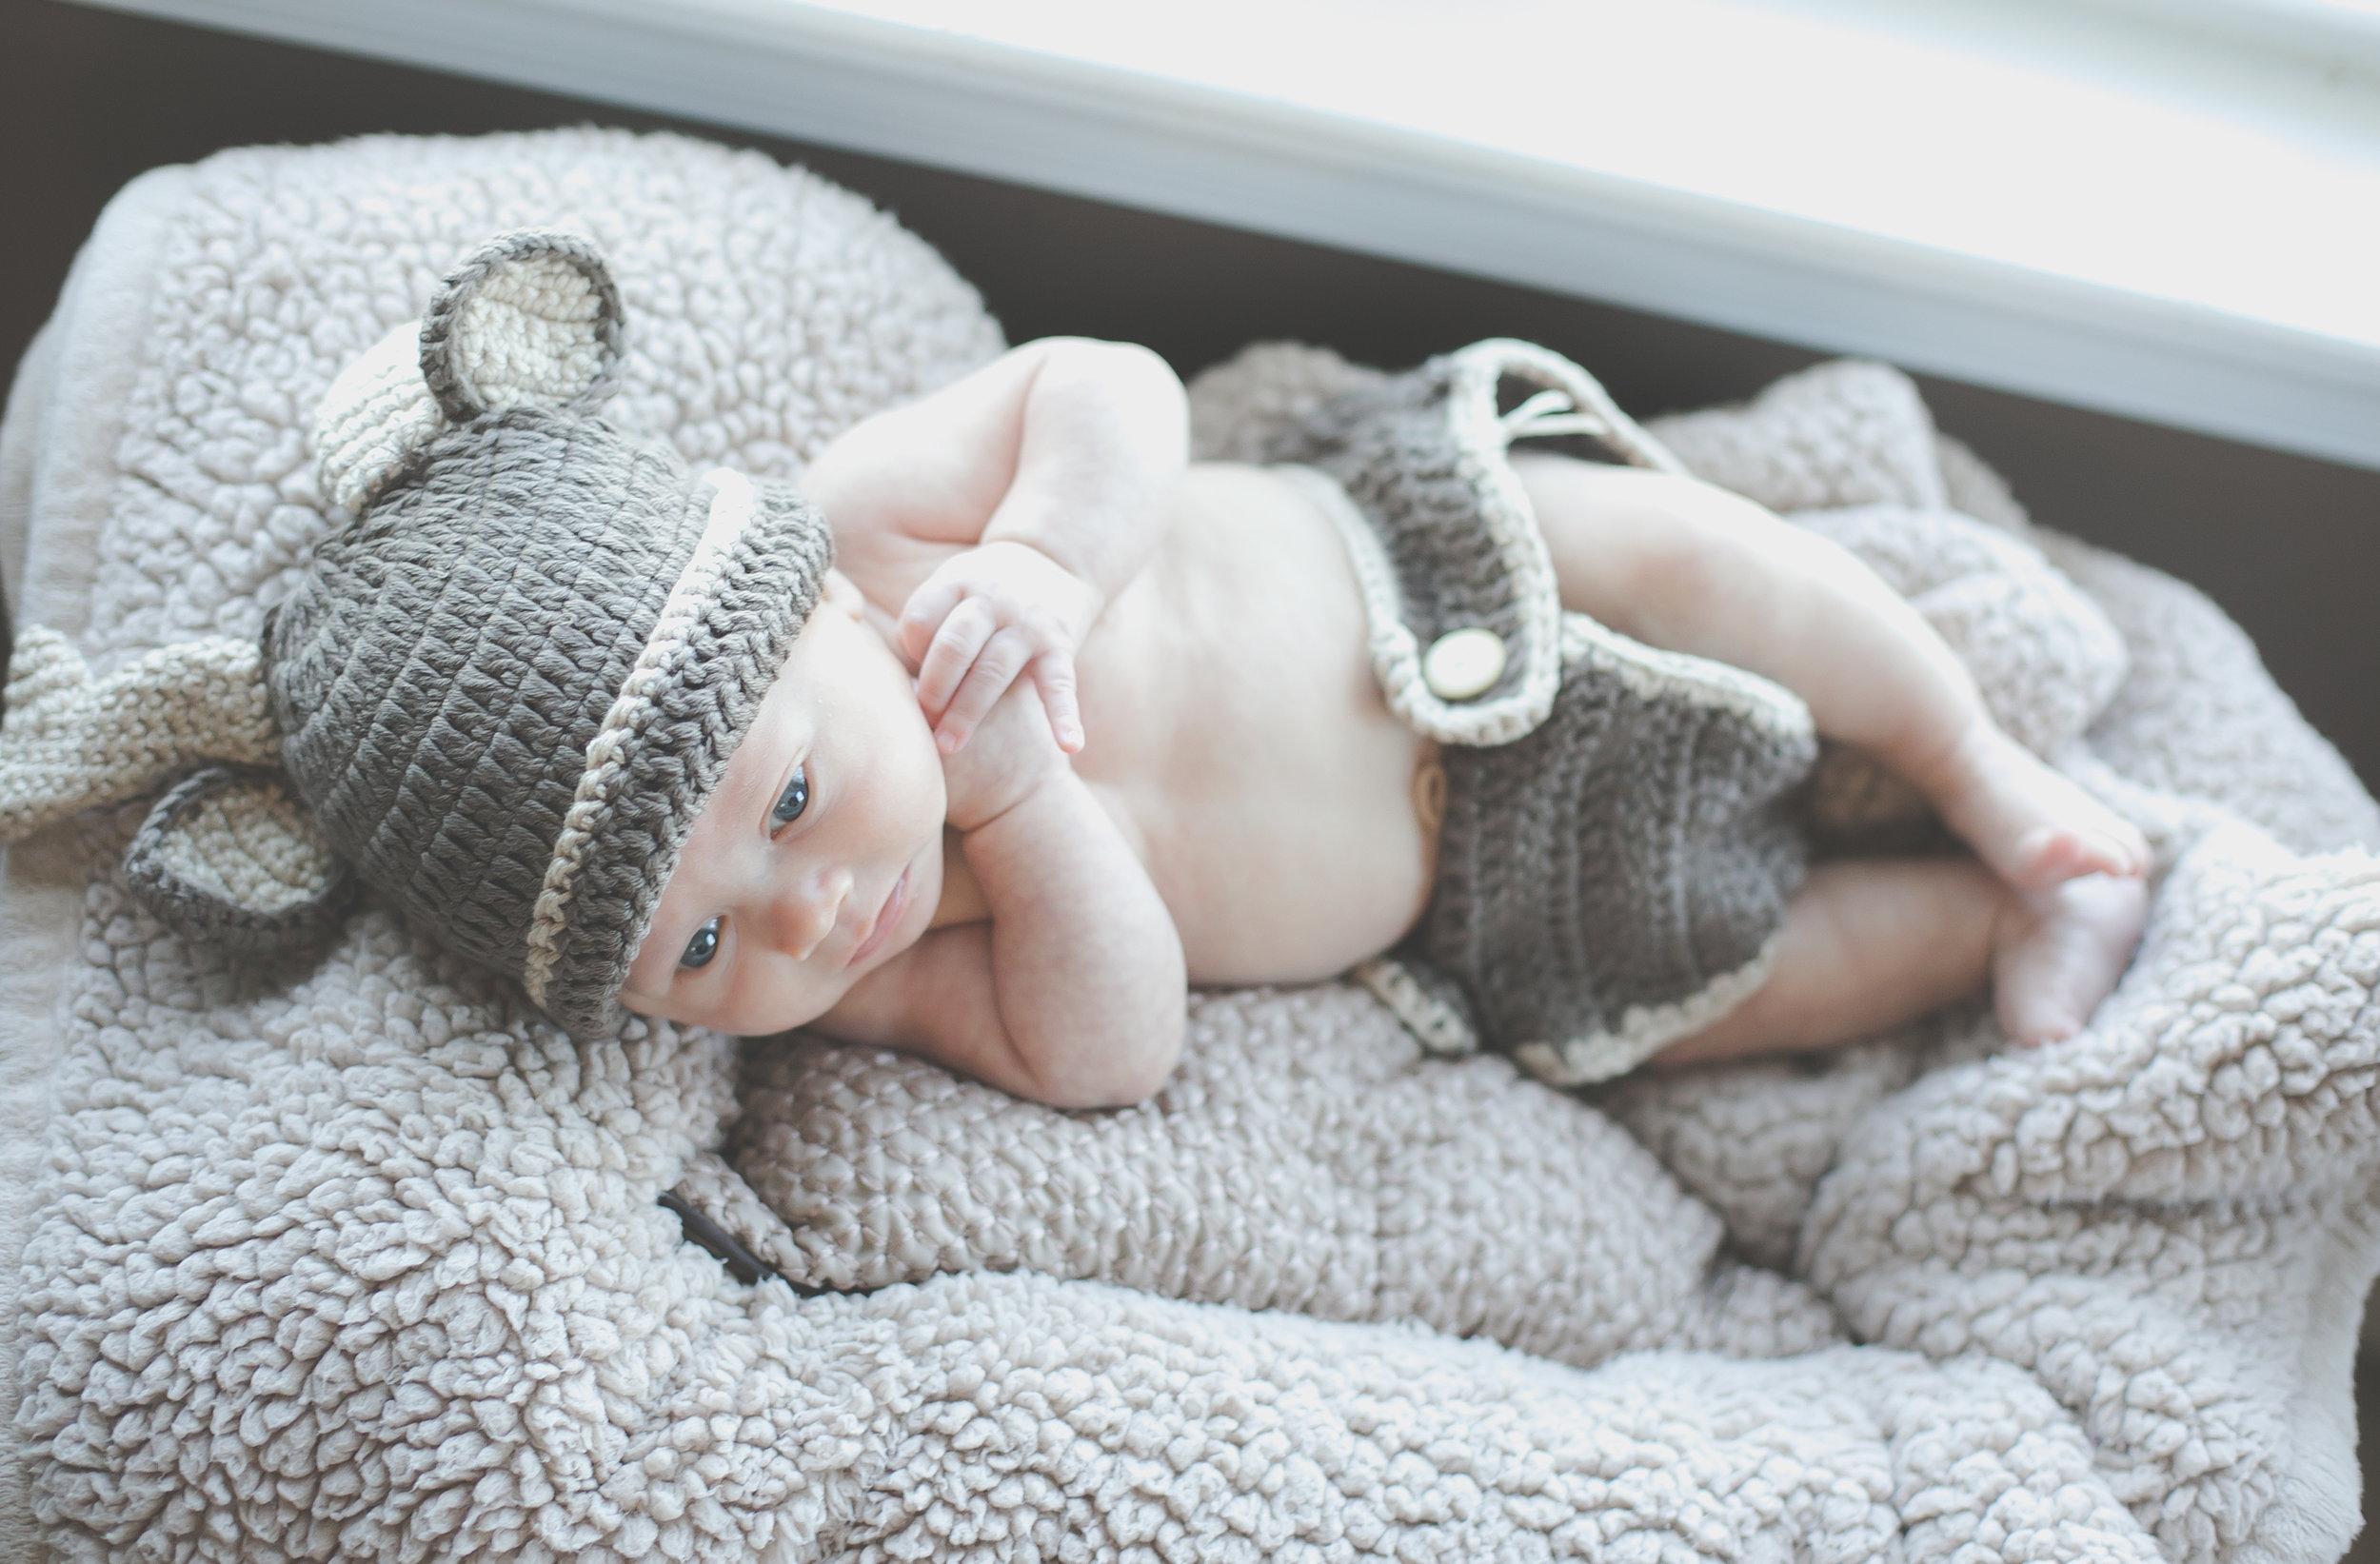 Oliver_Rutherford_Newborn_17Sept_068.jpg